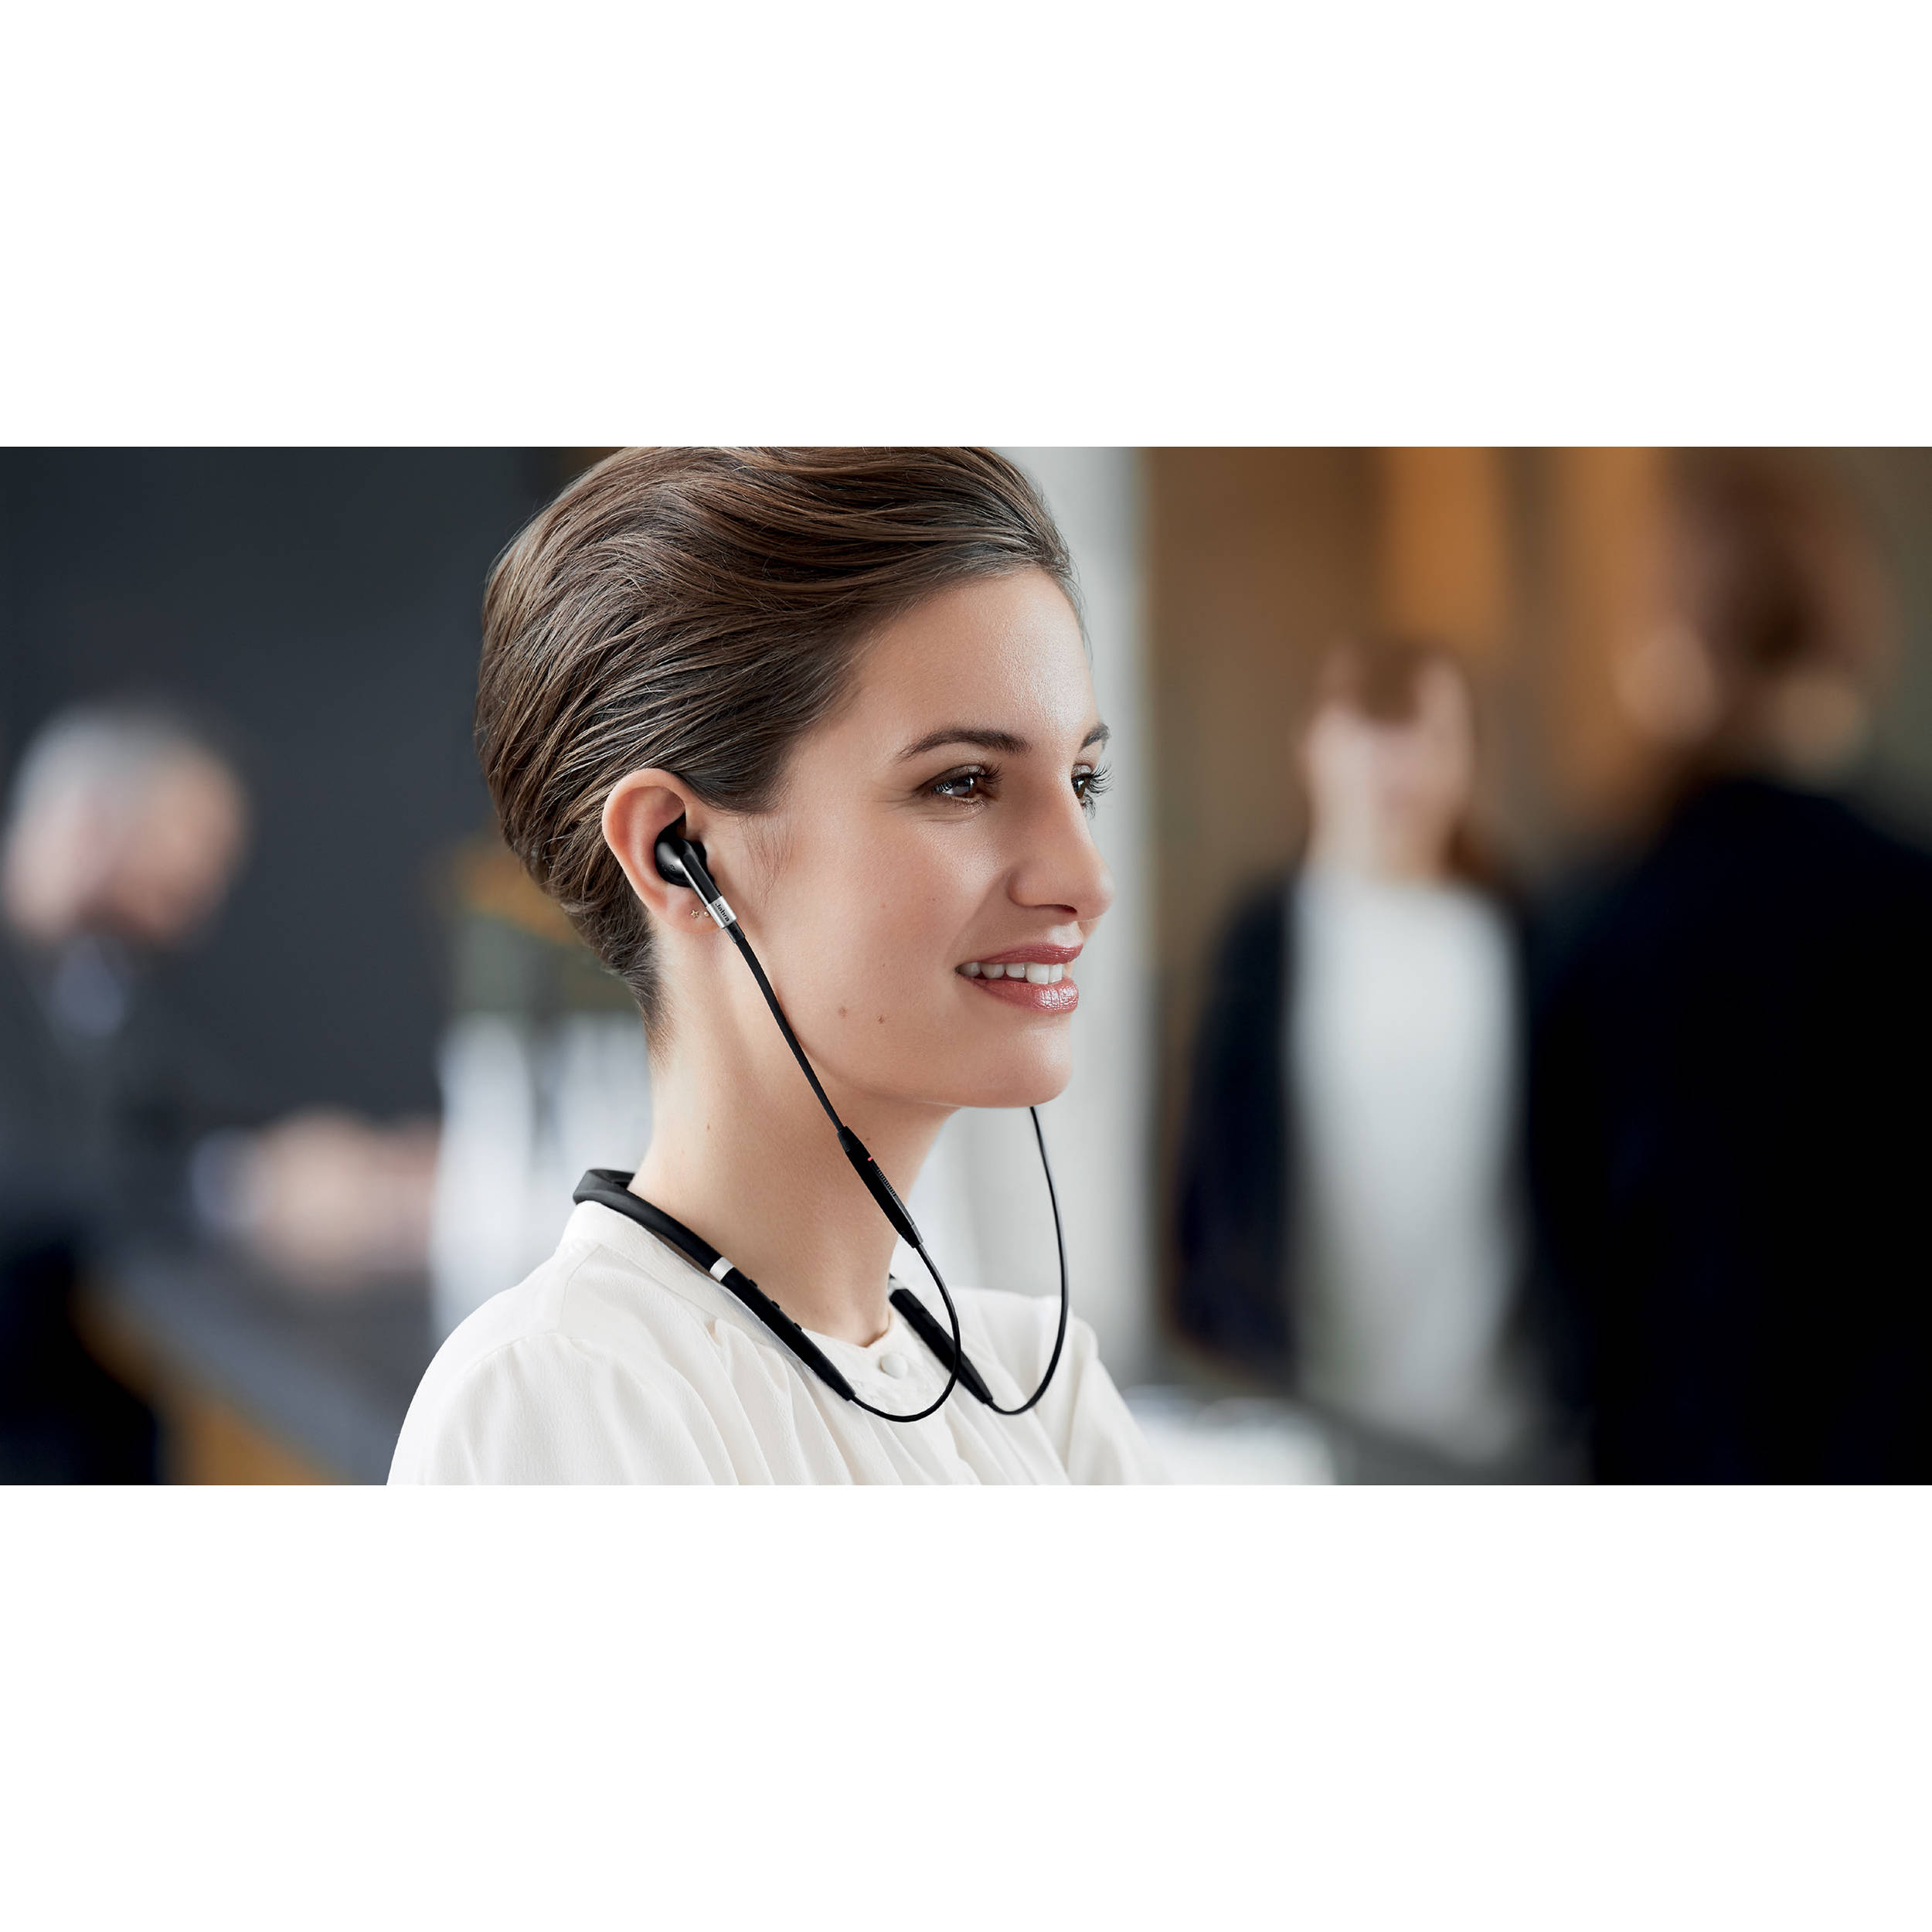 Jabra Evolve 75e Wireless Earbuds 7099 823 409 B H Photo Video